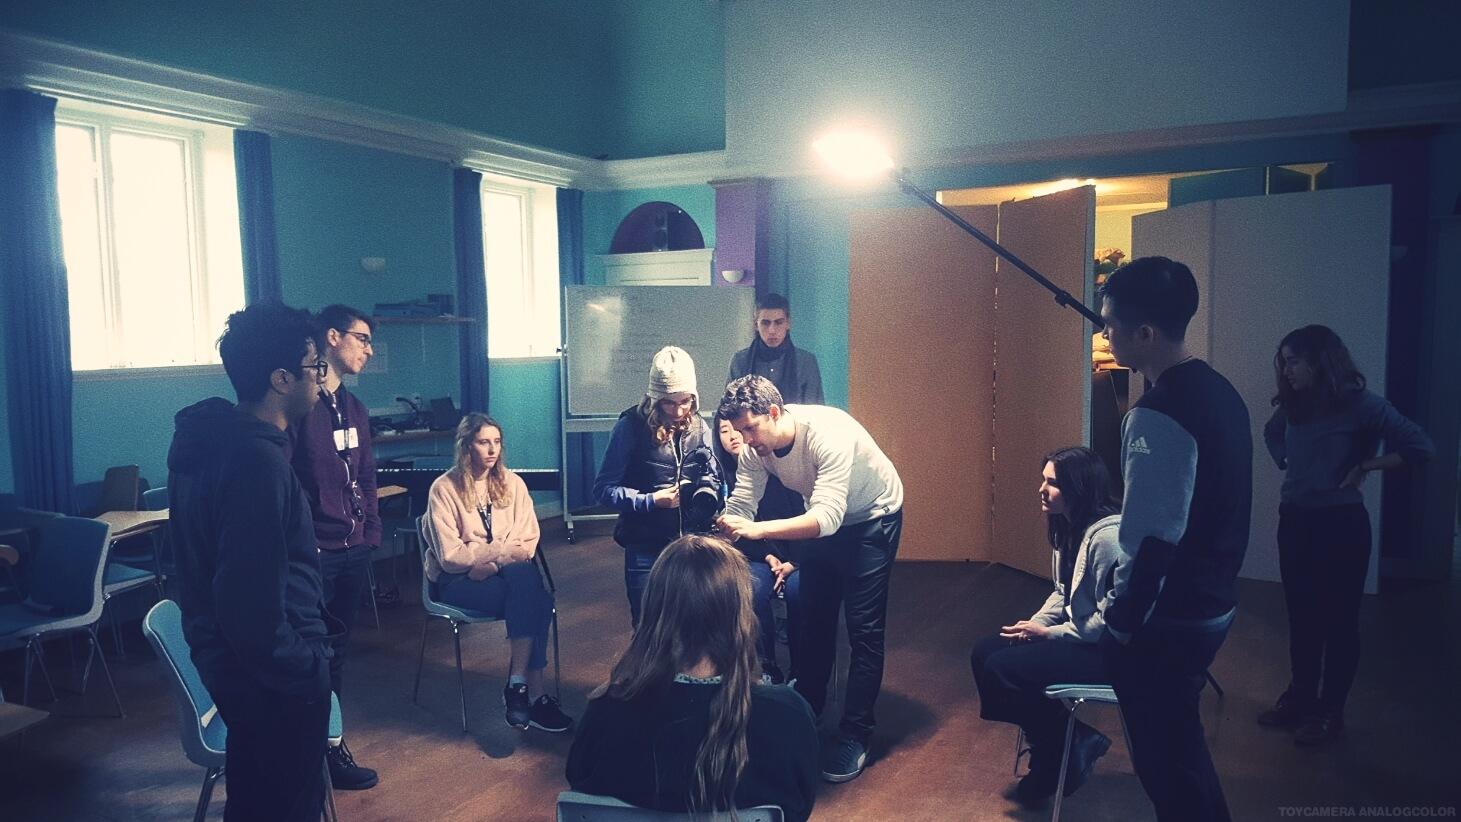 Folk High School Moviemaking Class at International People's College in Denmark